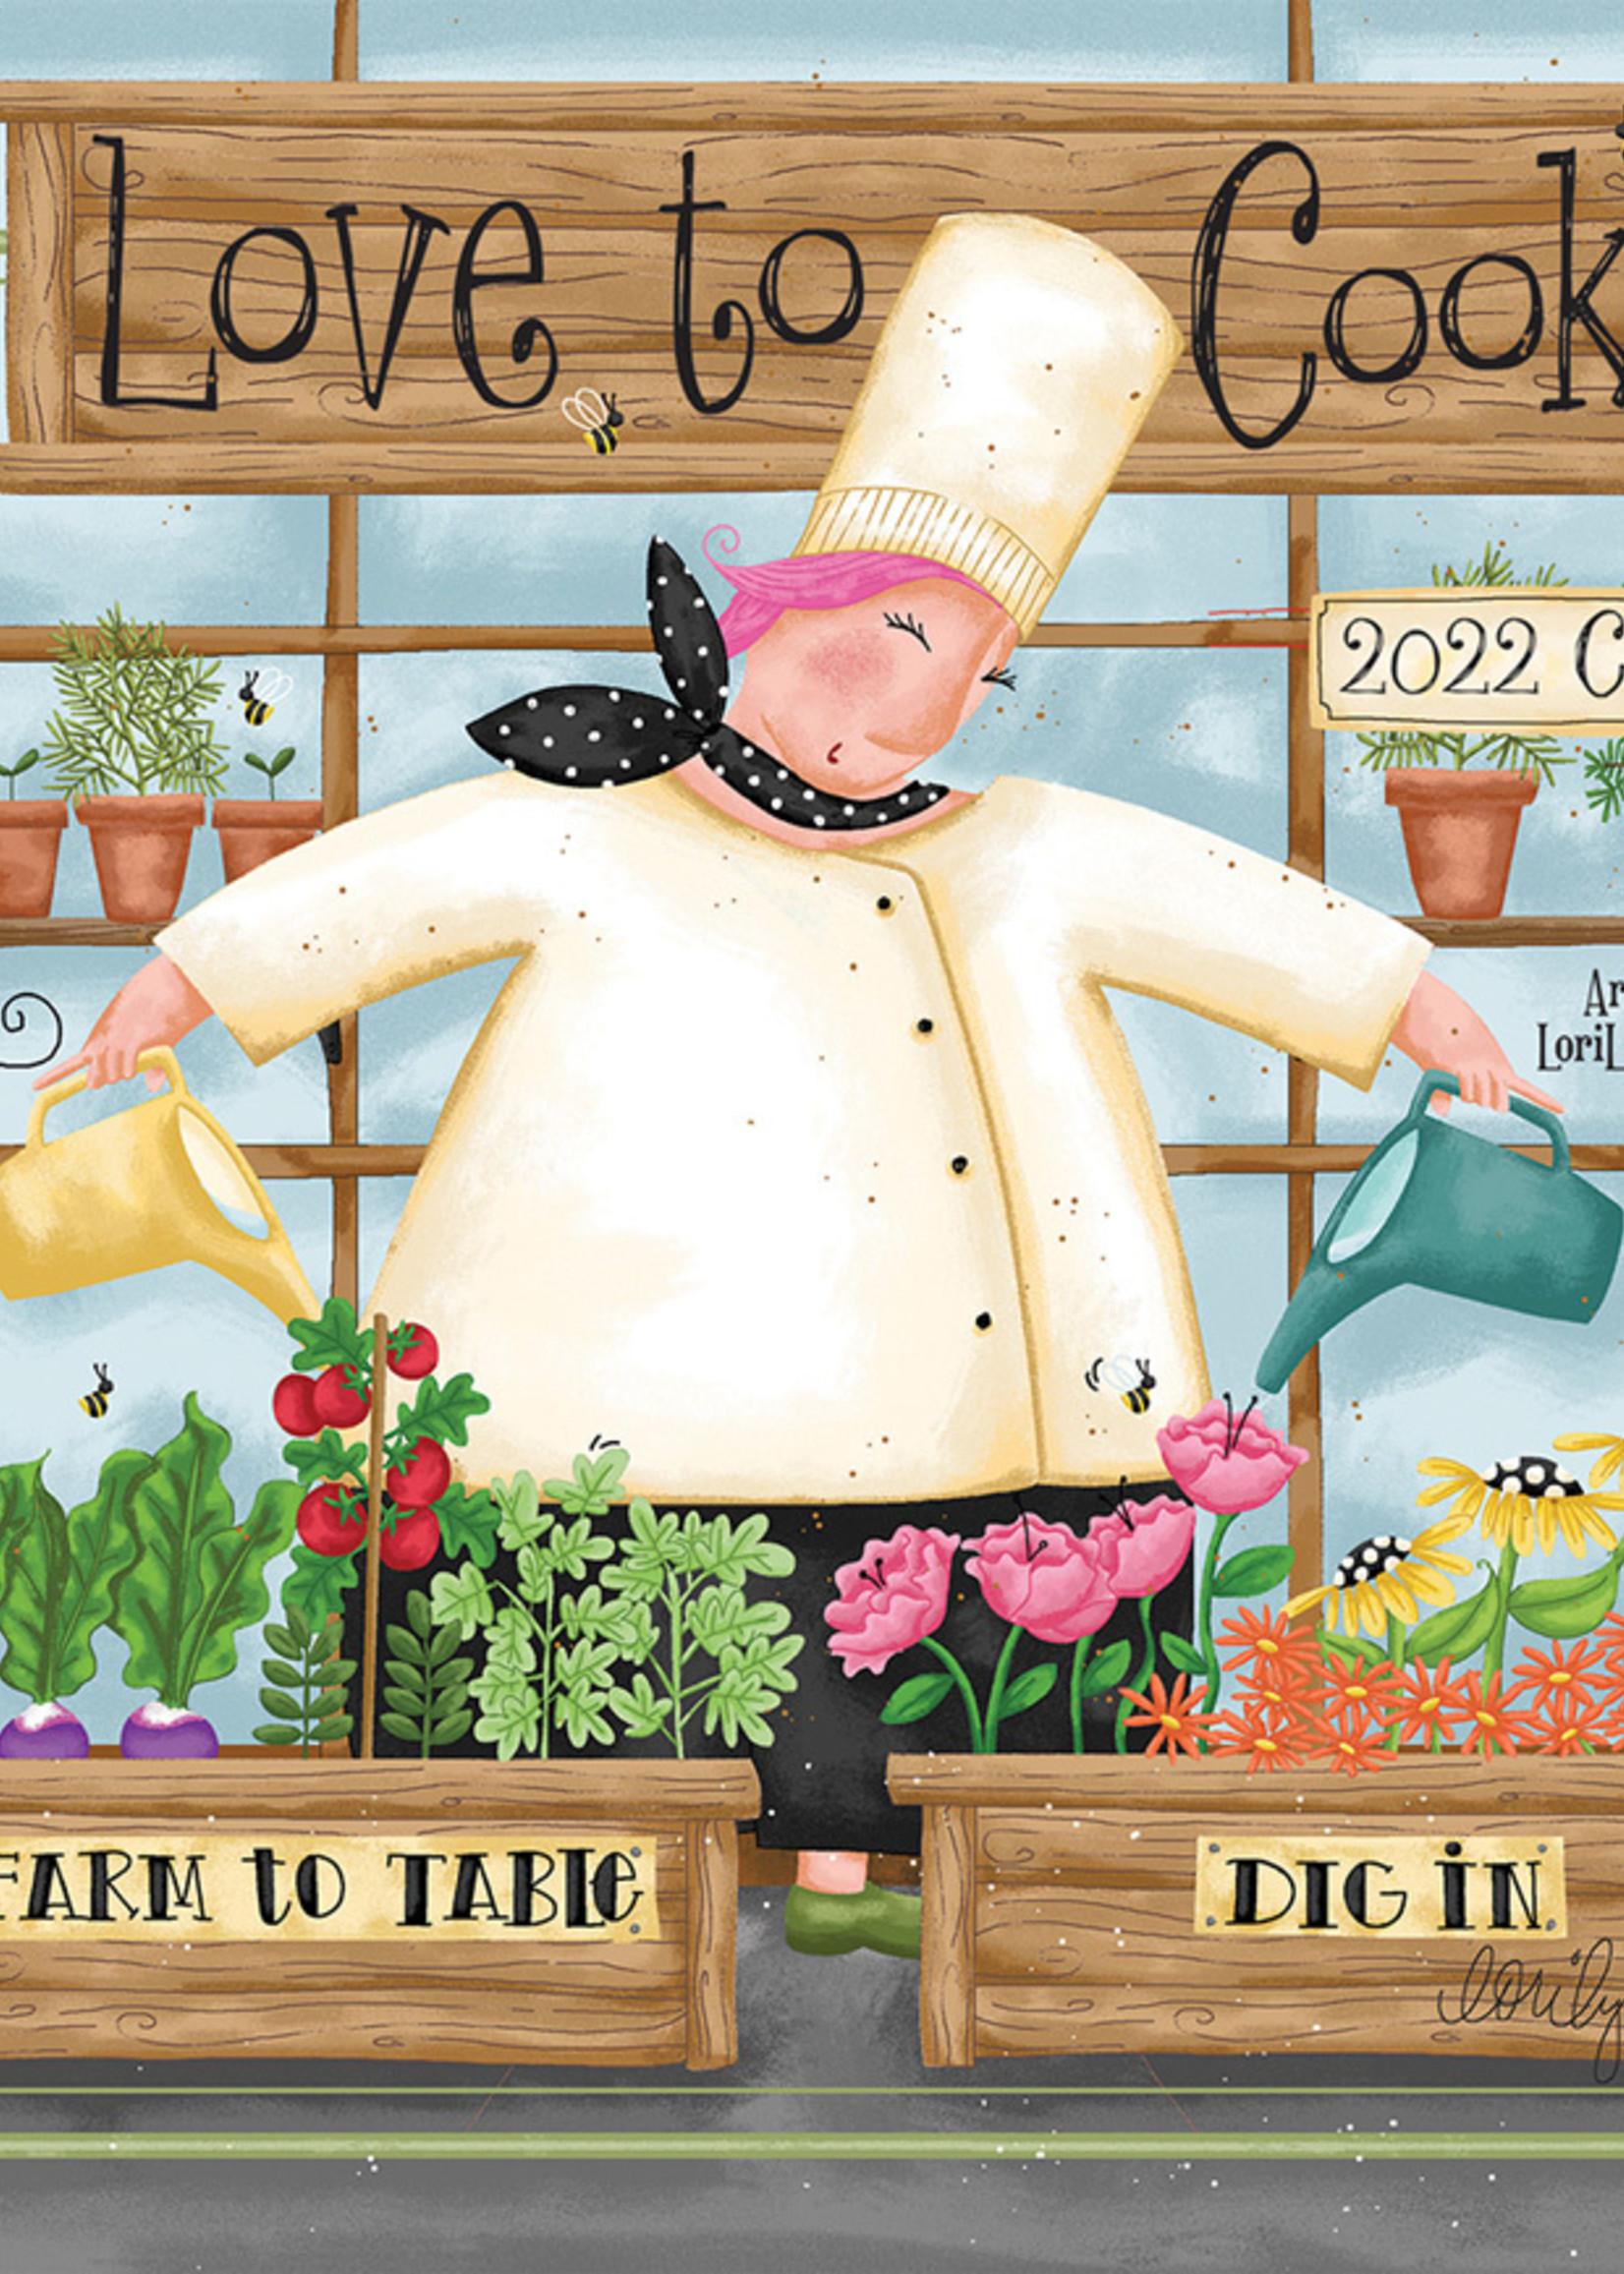 Love to Cook Calendar 2022